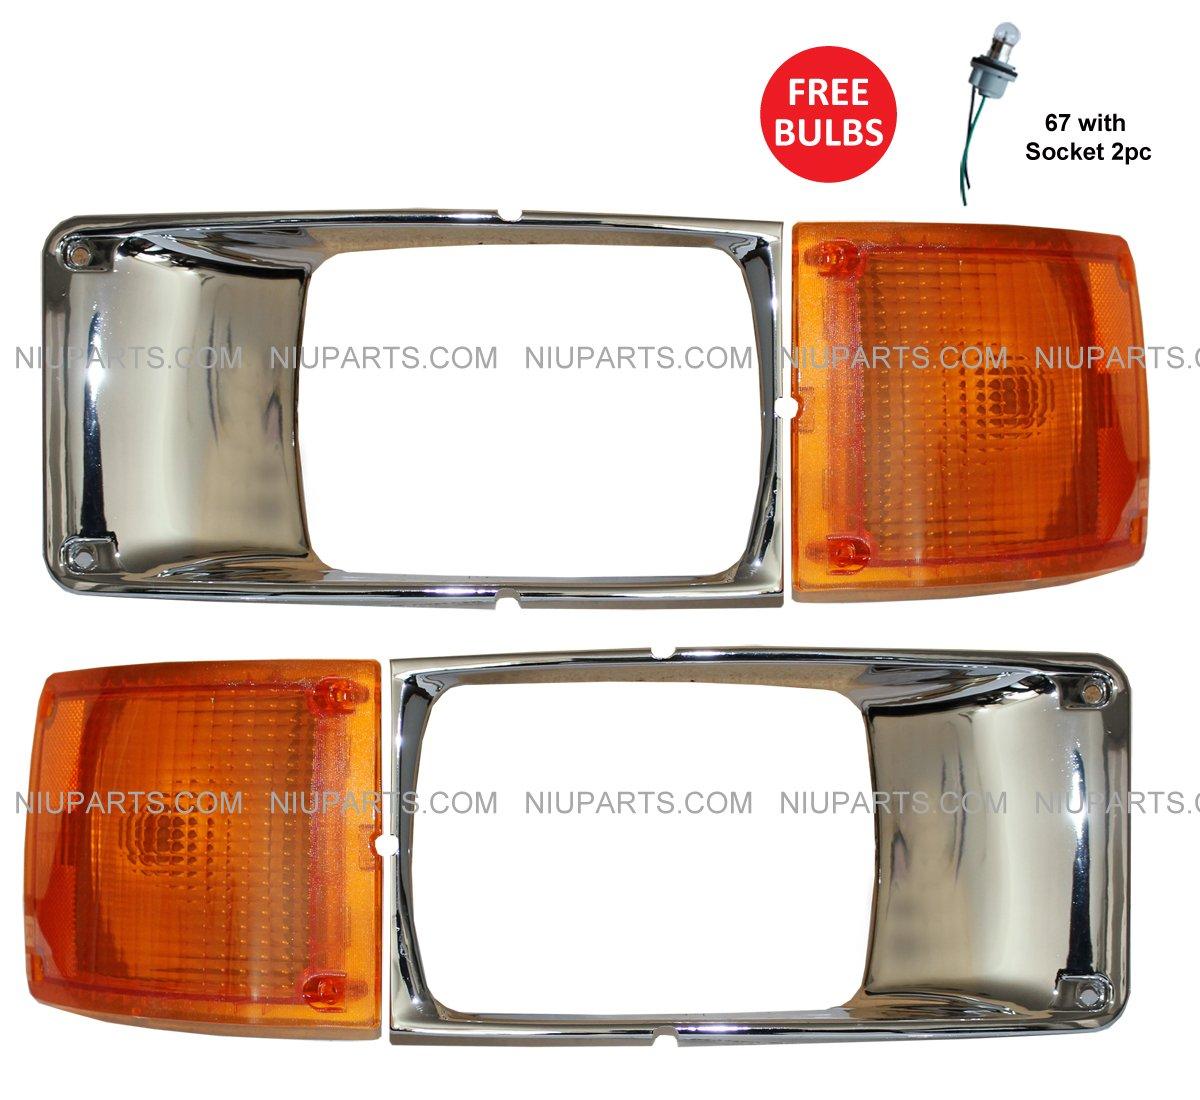 Headlight Lamp Bezel Chrome and Corner Trun Signal Light - Driver and Passenger Side (Fit: International 3800 4700 4800 4900 8100 8200) NIUPARTS